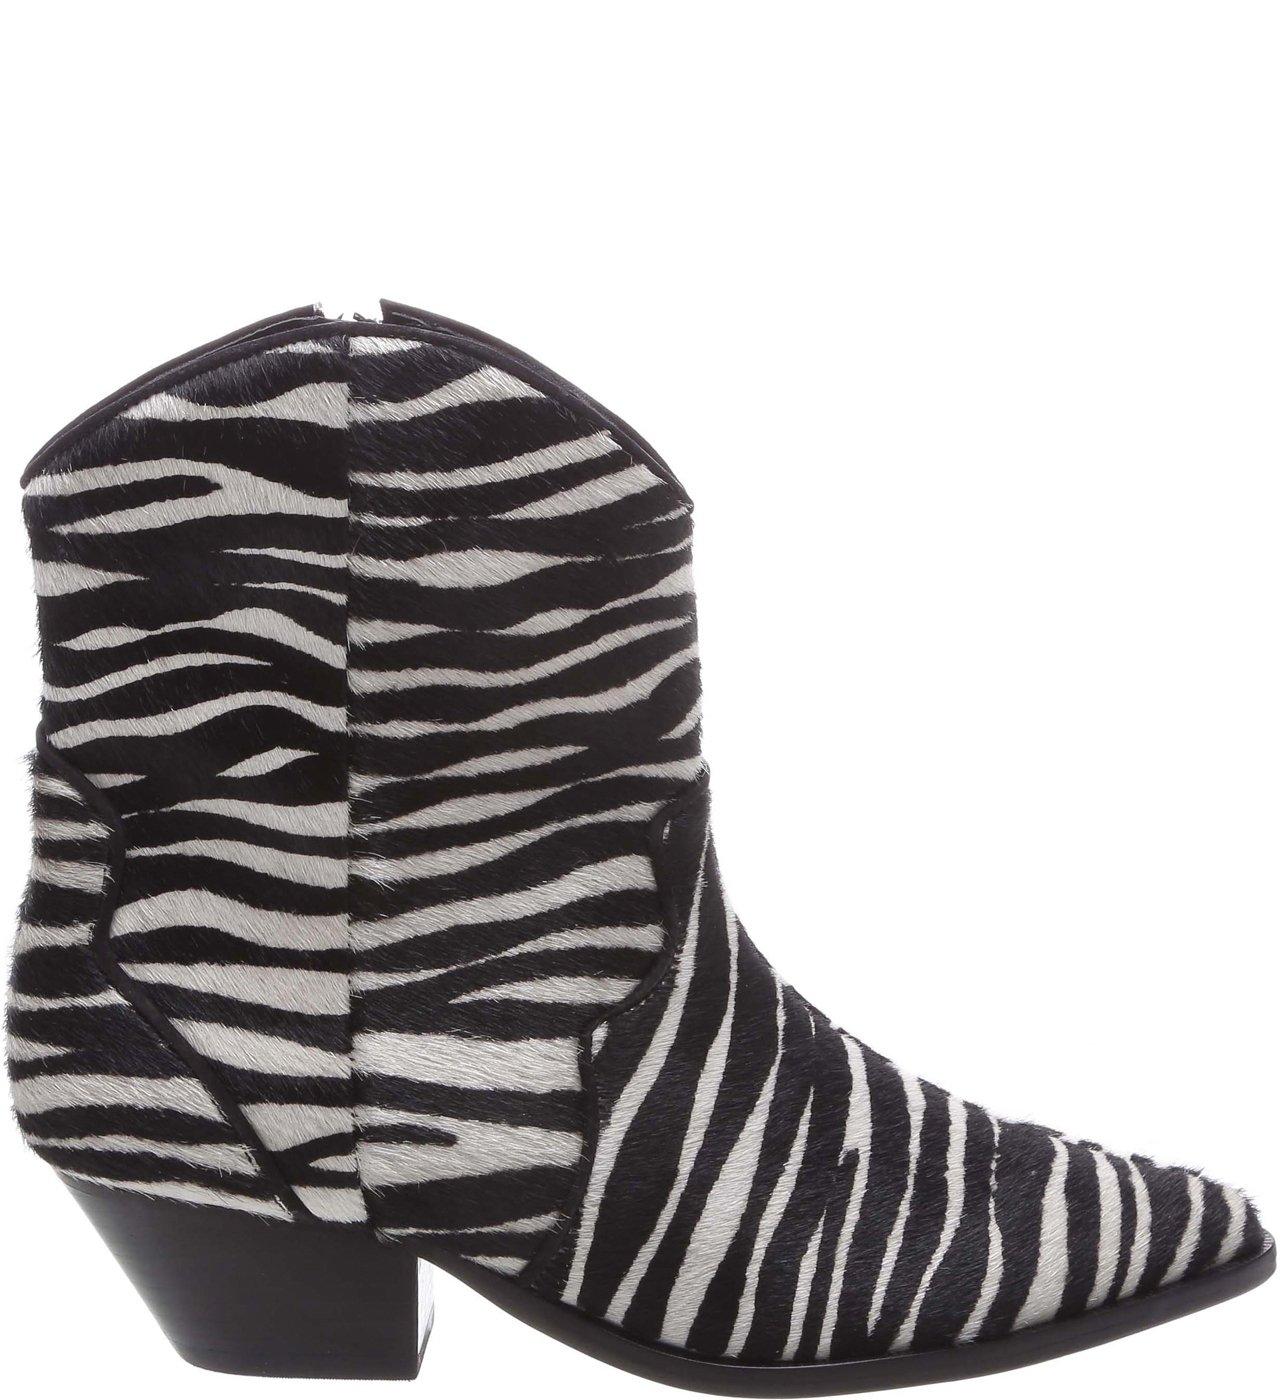 Cowboy Boot Zebra Print | Schutz